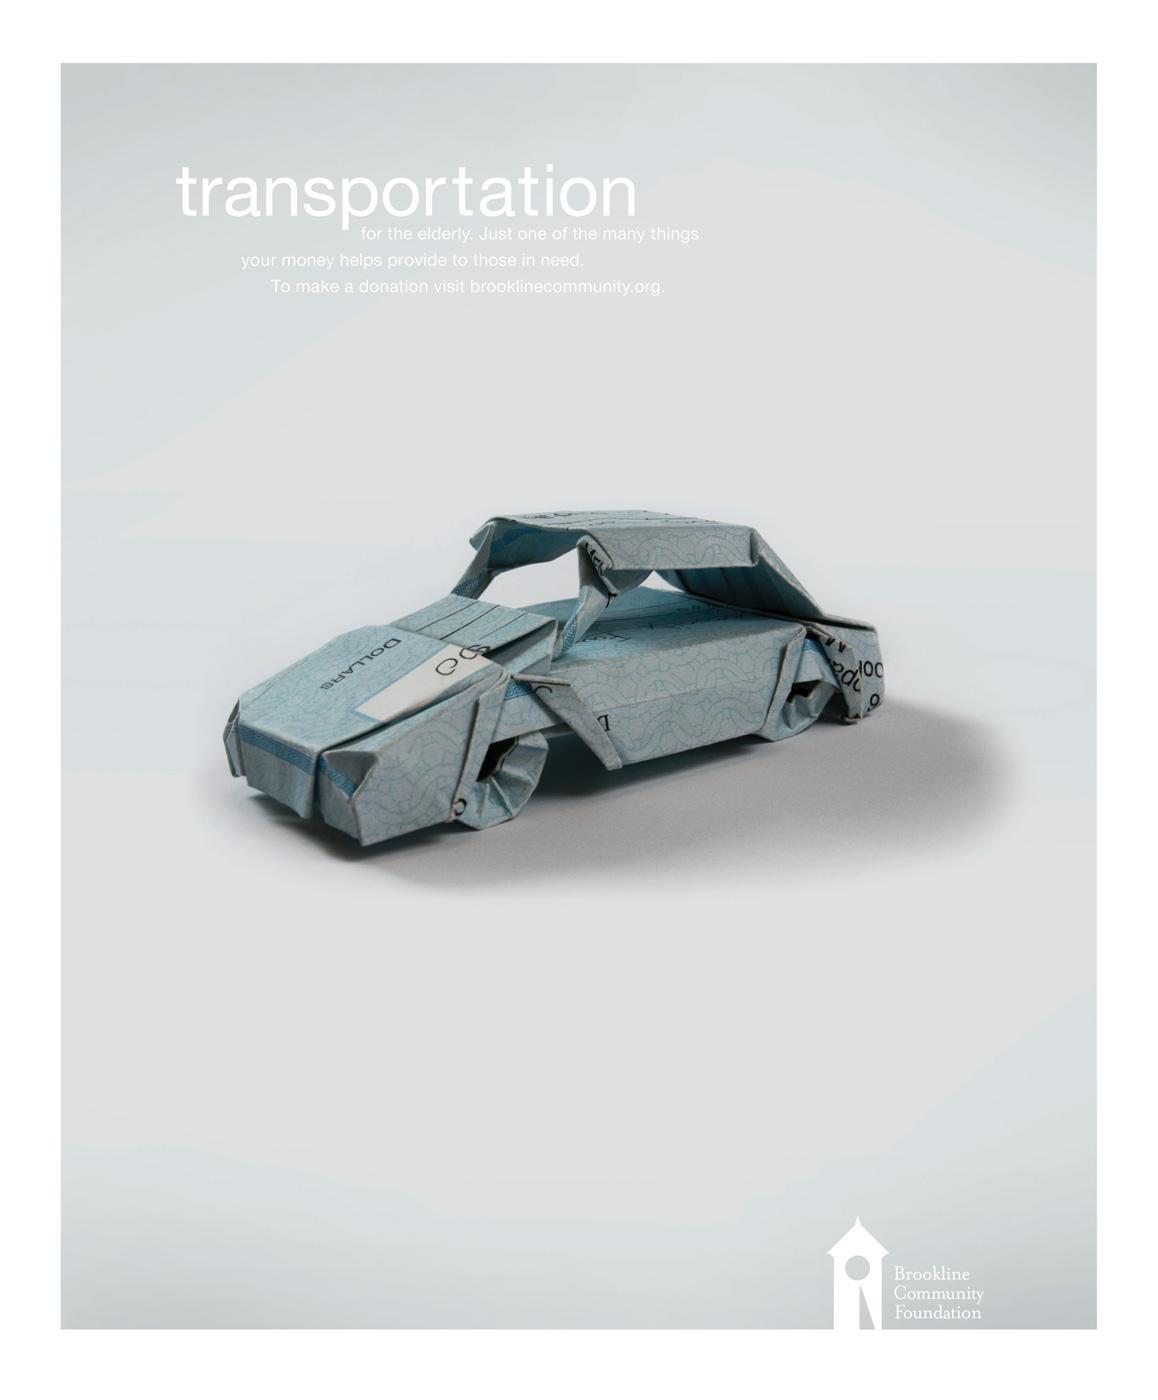 Brookline Community Foundation Print Ad -  Transportation